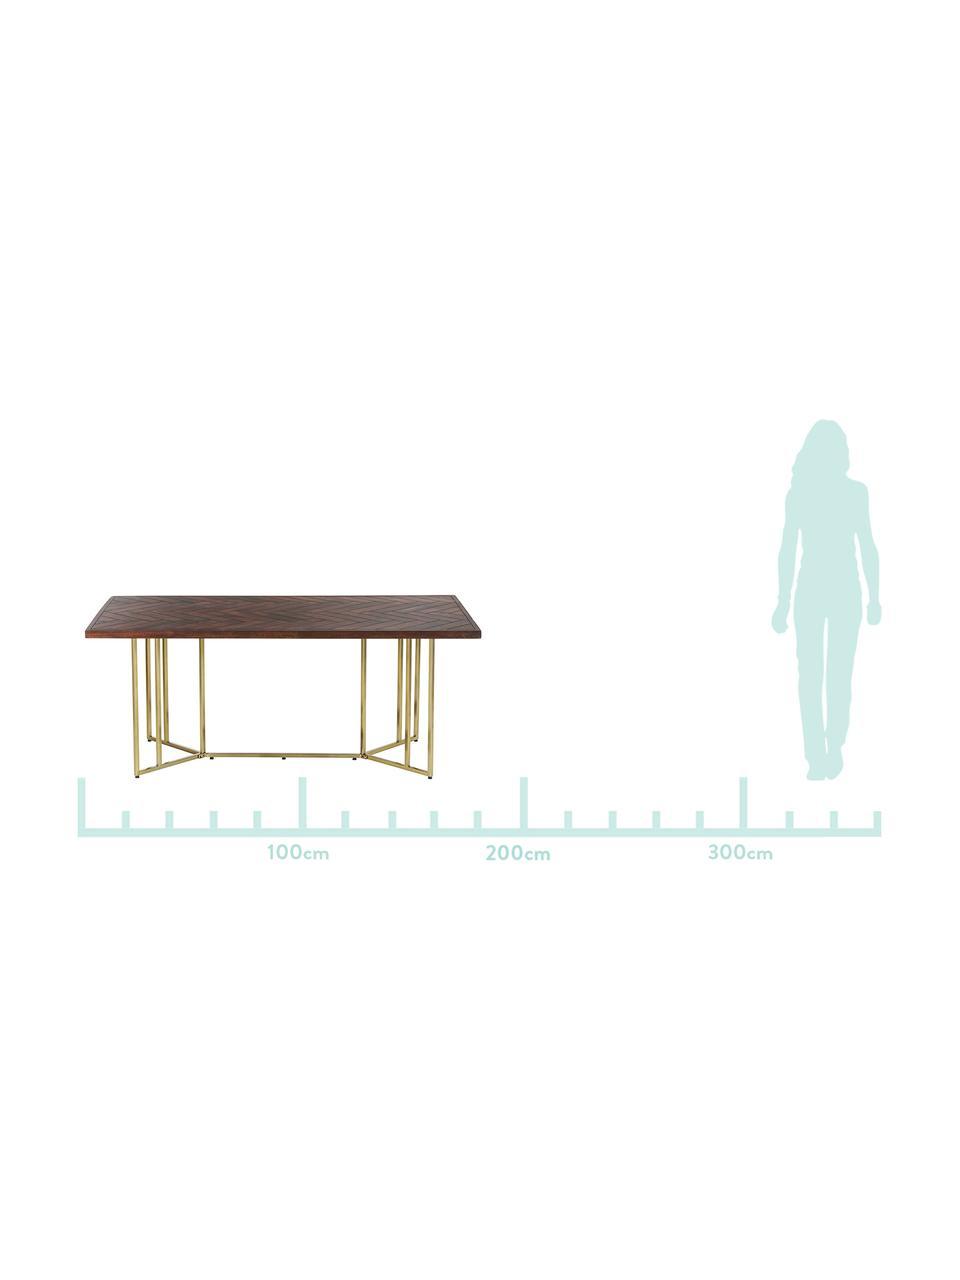 Massivholz Esstisch Luca mit Fischgrätmuster, Tischplatte: Massives Mangoholz, lacki, Gestell: Metall, beschichtet, Tischplatte: Mangoholz, dunkel lackiertGestell: Goldfarben, B 220 x T 100 cm